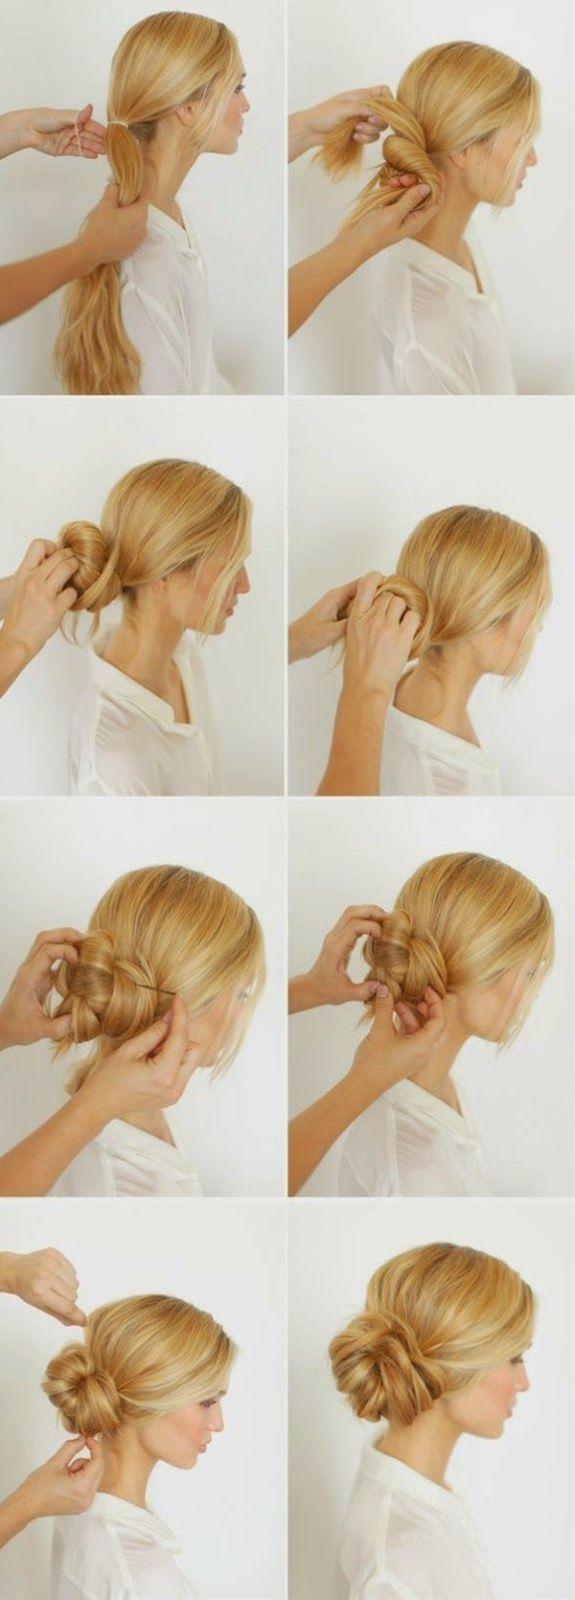 How to chic knotted bun tutorial bun tutorials tutorials and plays how to chic knotted bun tutorial baditri Gallery